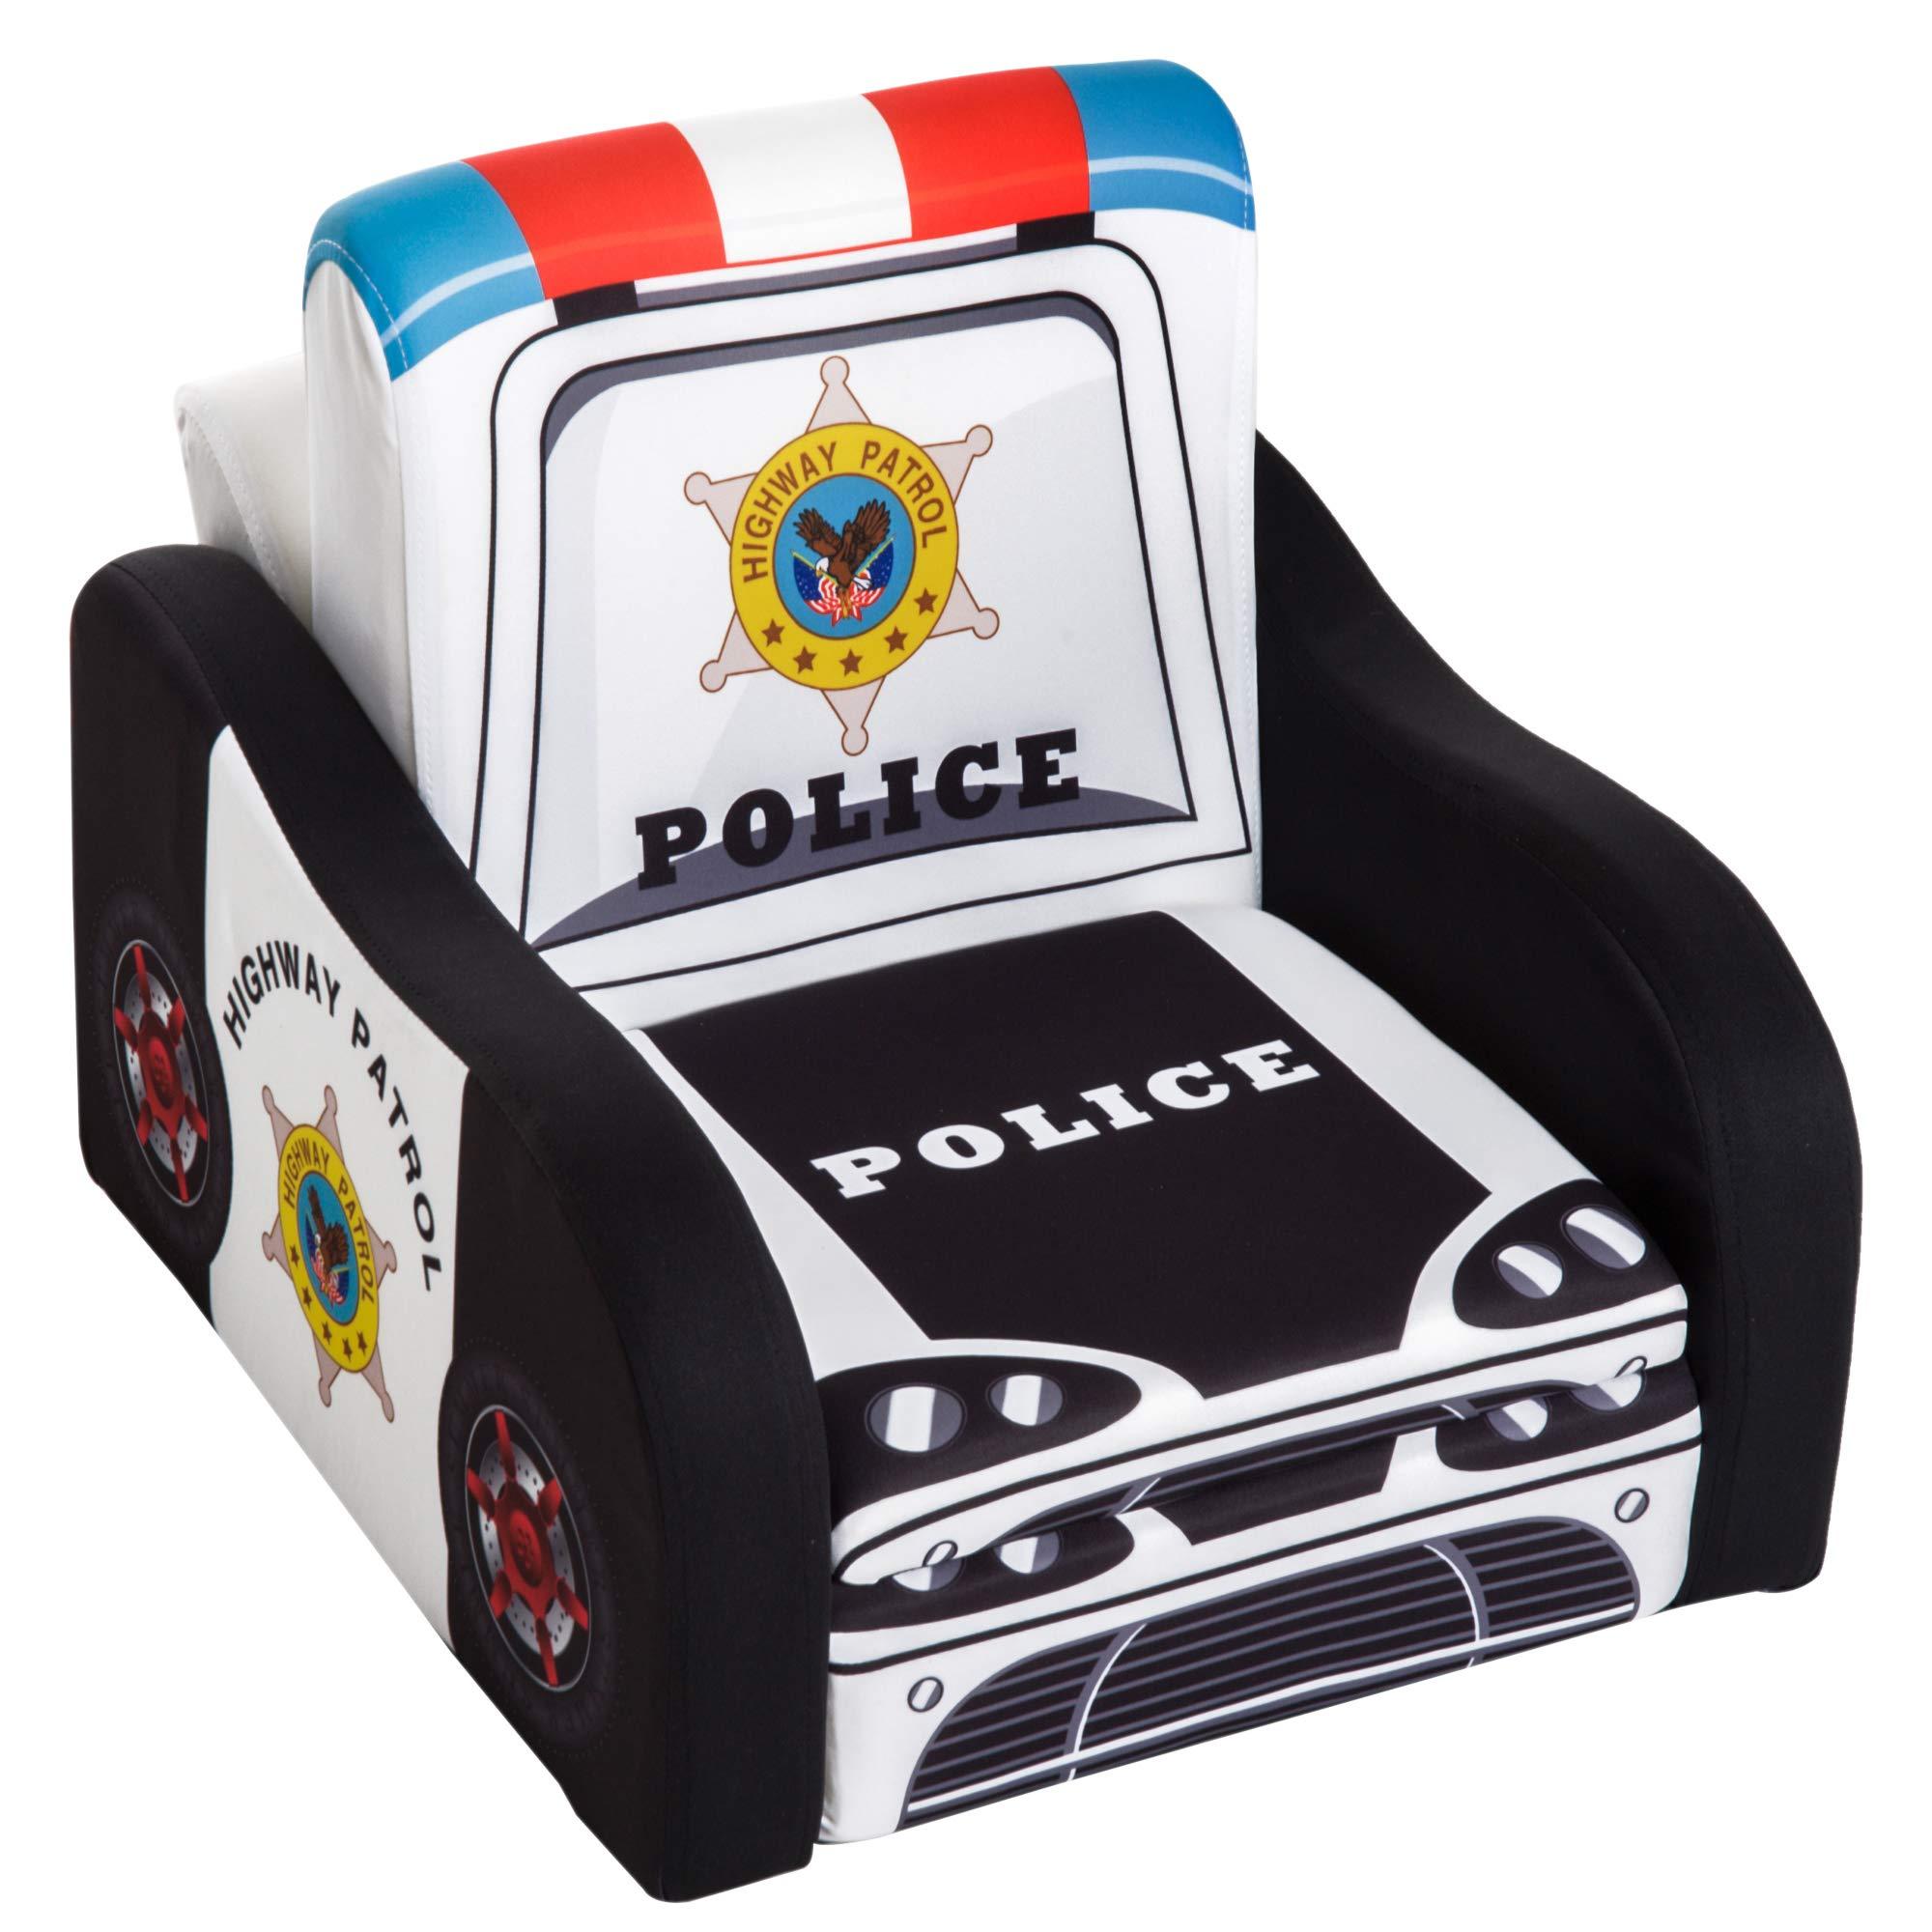 Qaba 17'' Multi Spandex Storage Sofa Chair for Kids - Police Car